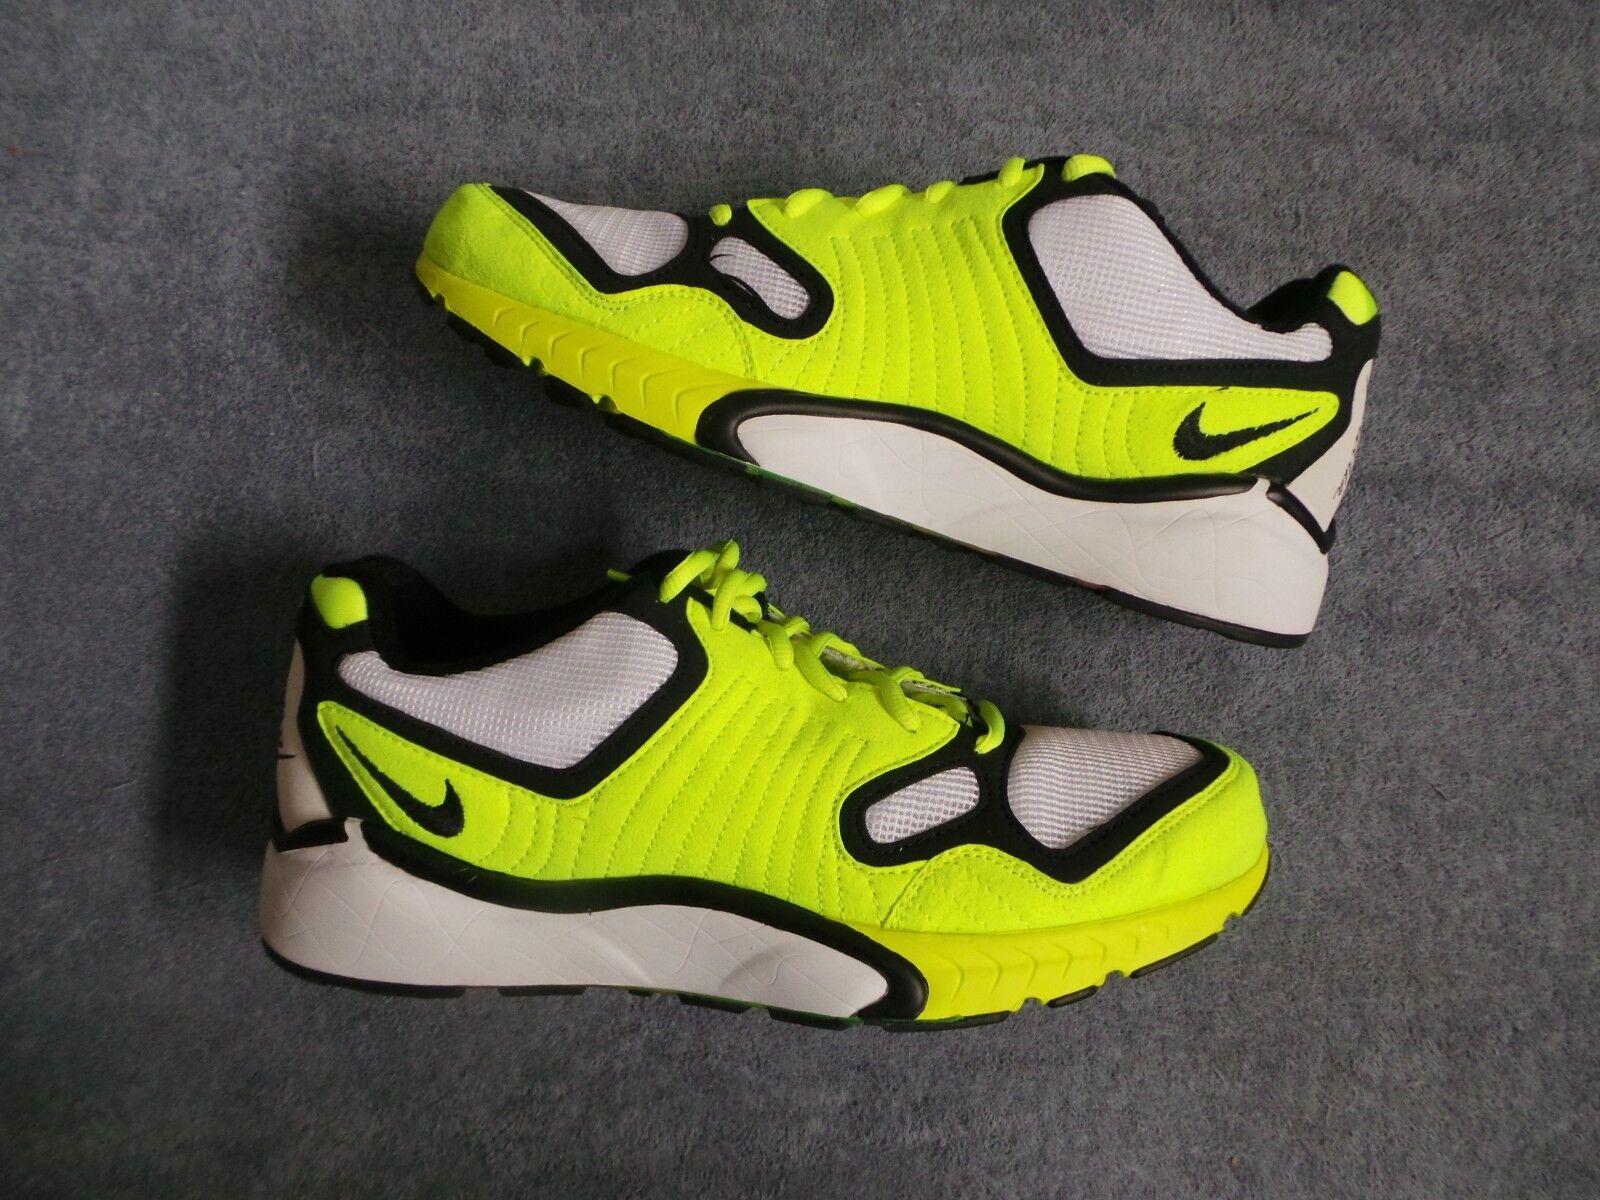 Nike air zoom talaria 2016